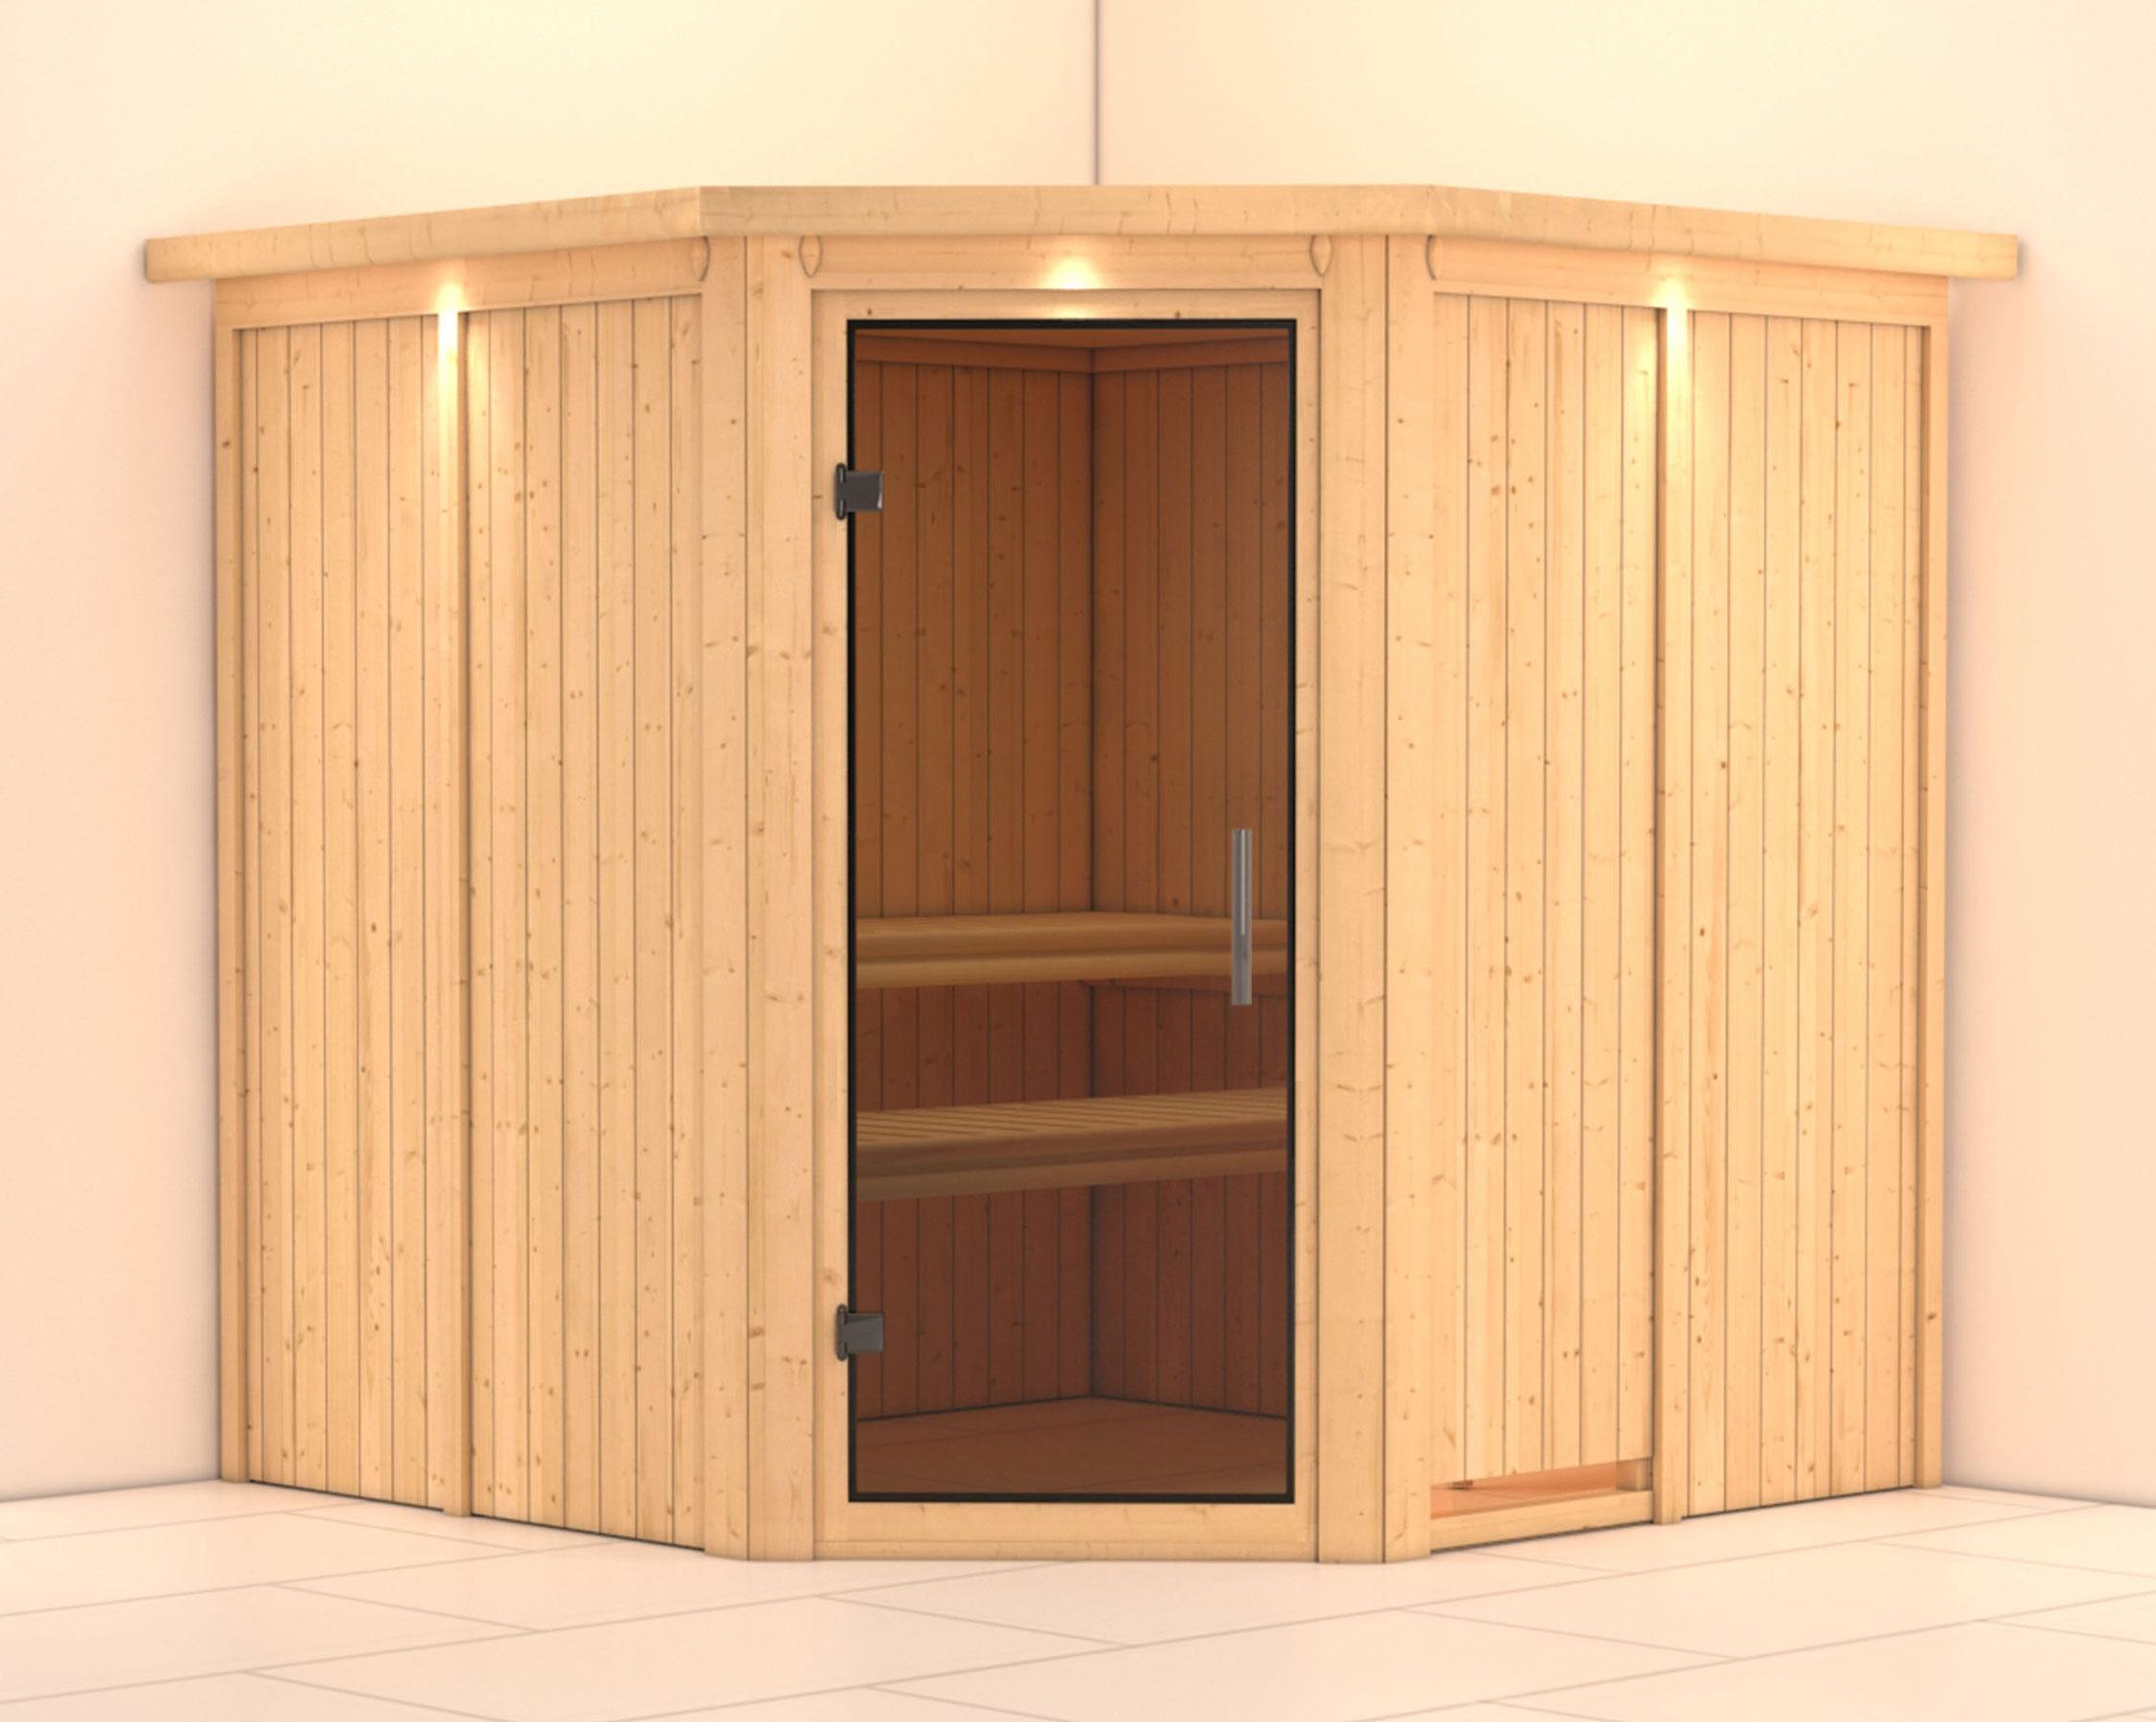 Karibu Sauna Jarin 68mm Dachkranz ohne Ofen moderne Tür Bild 1